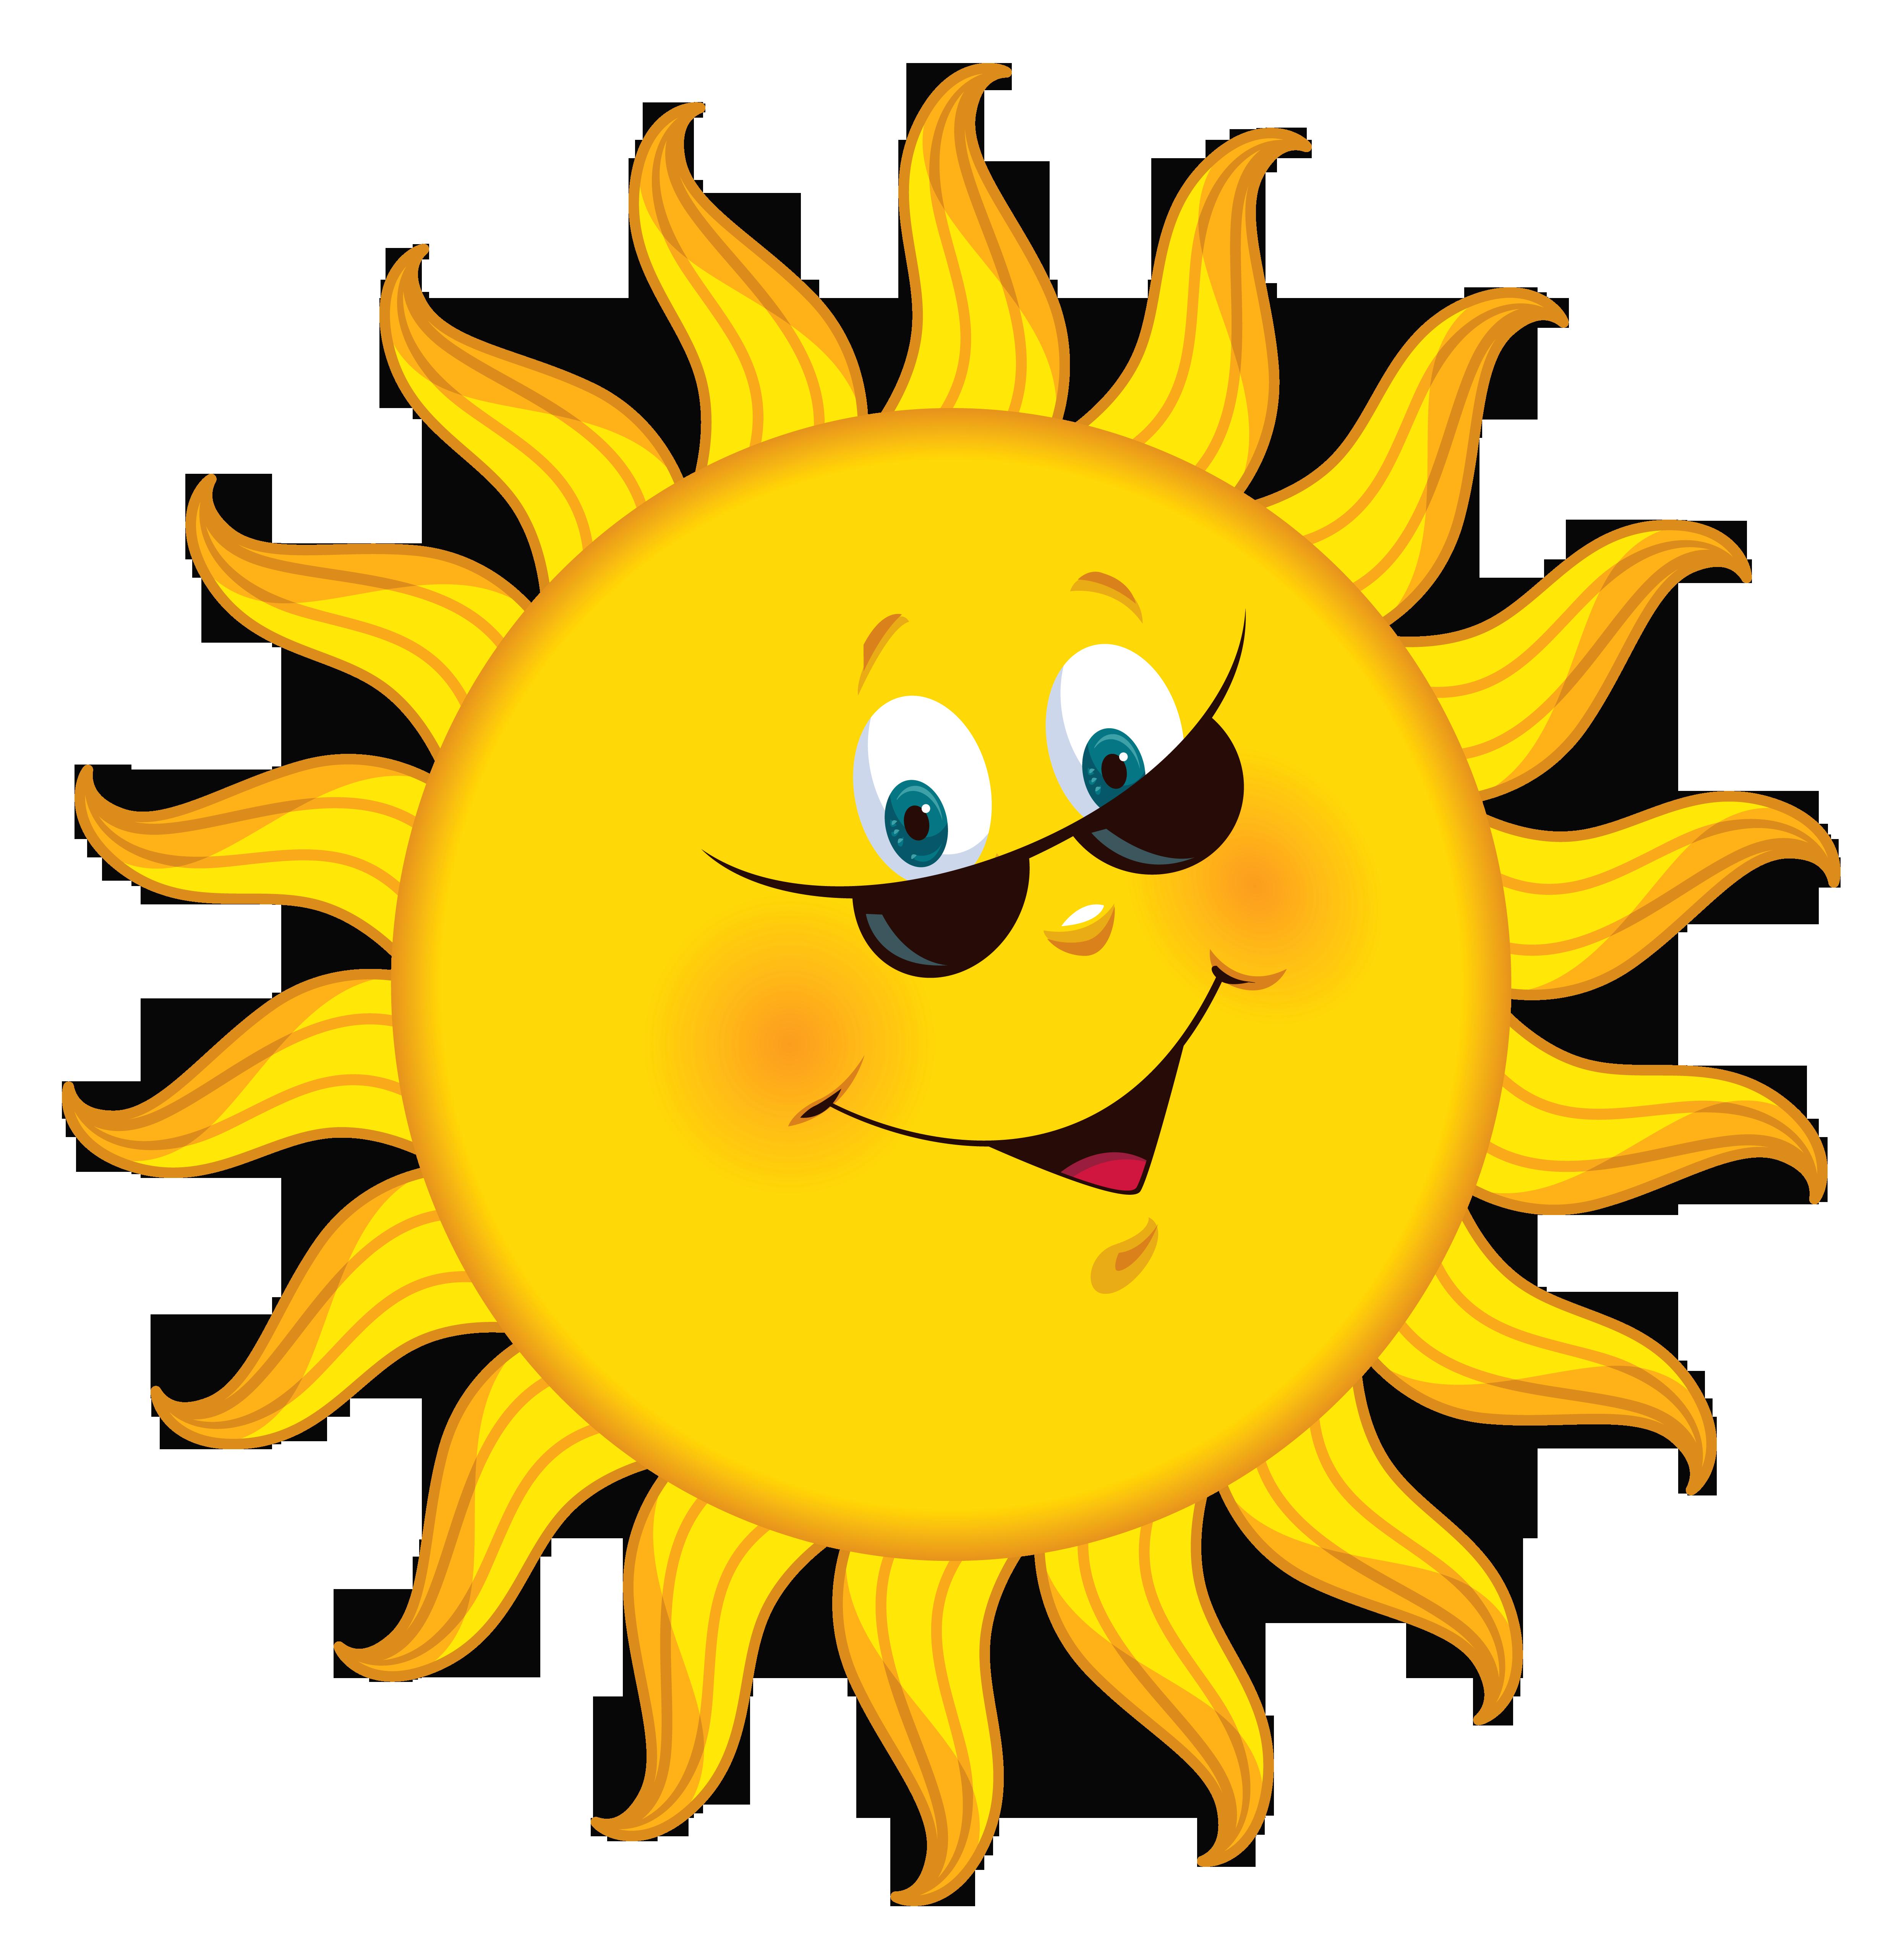 Clipart math transparent background. Cartoon sun png picture